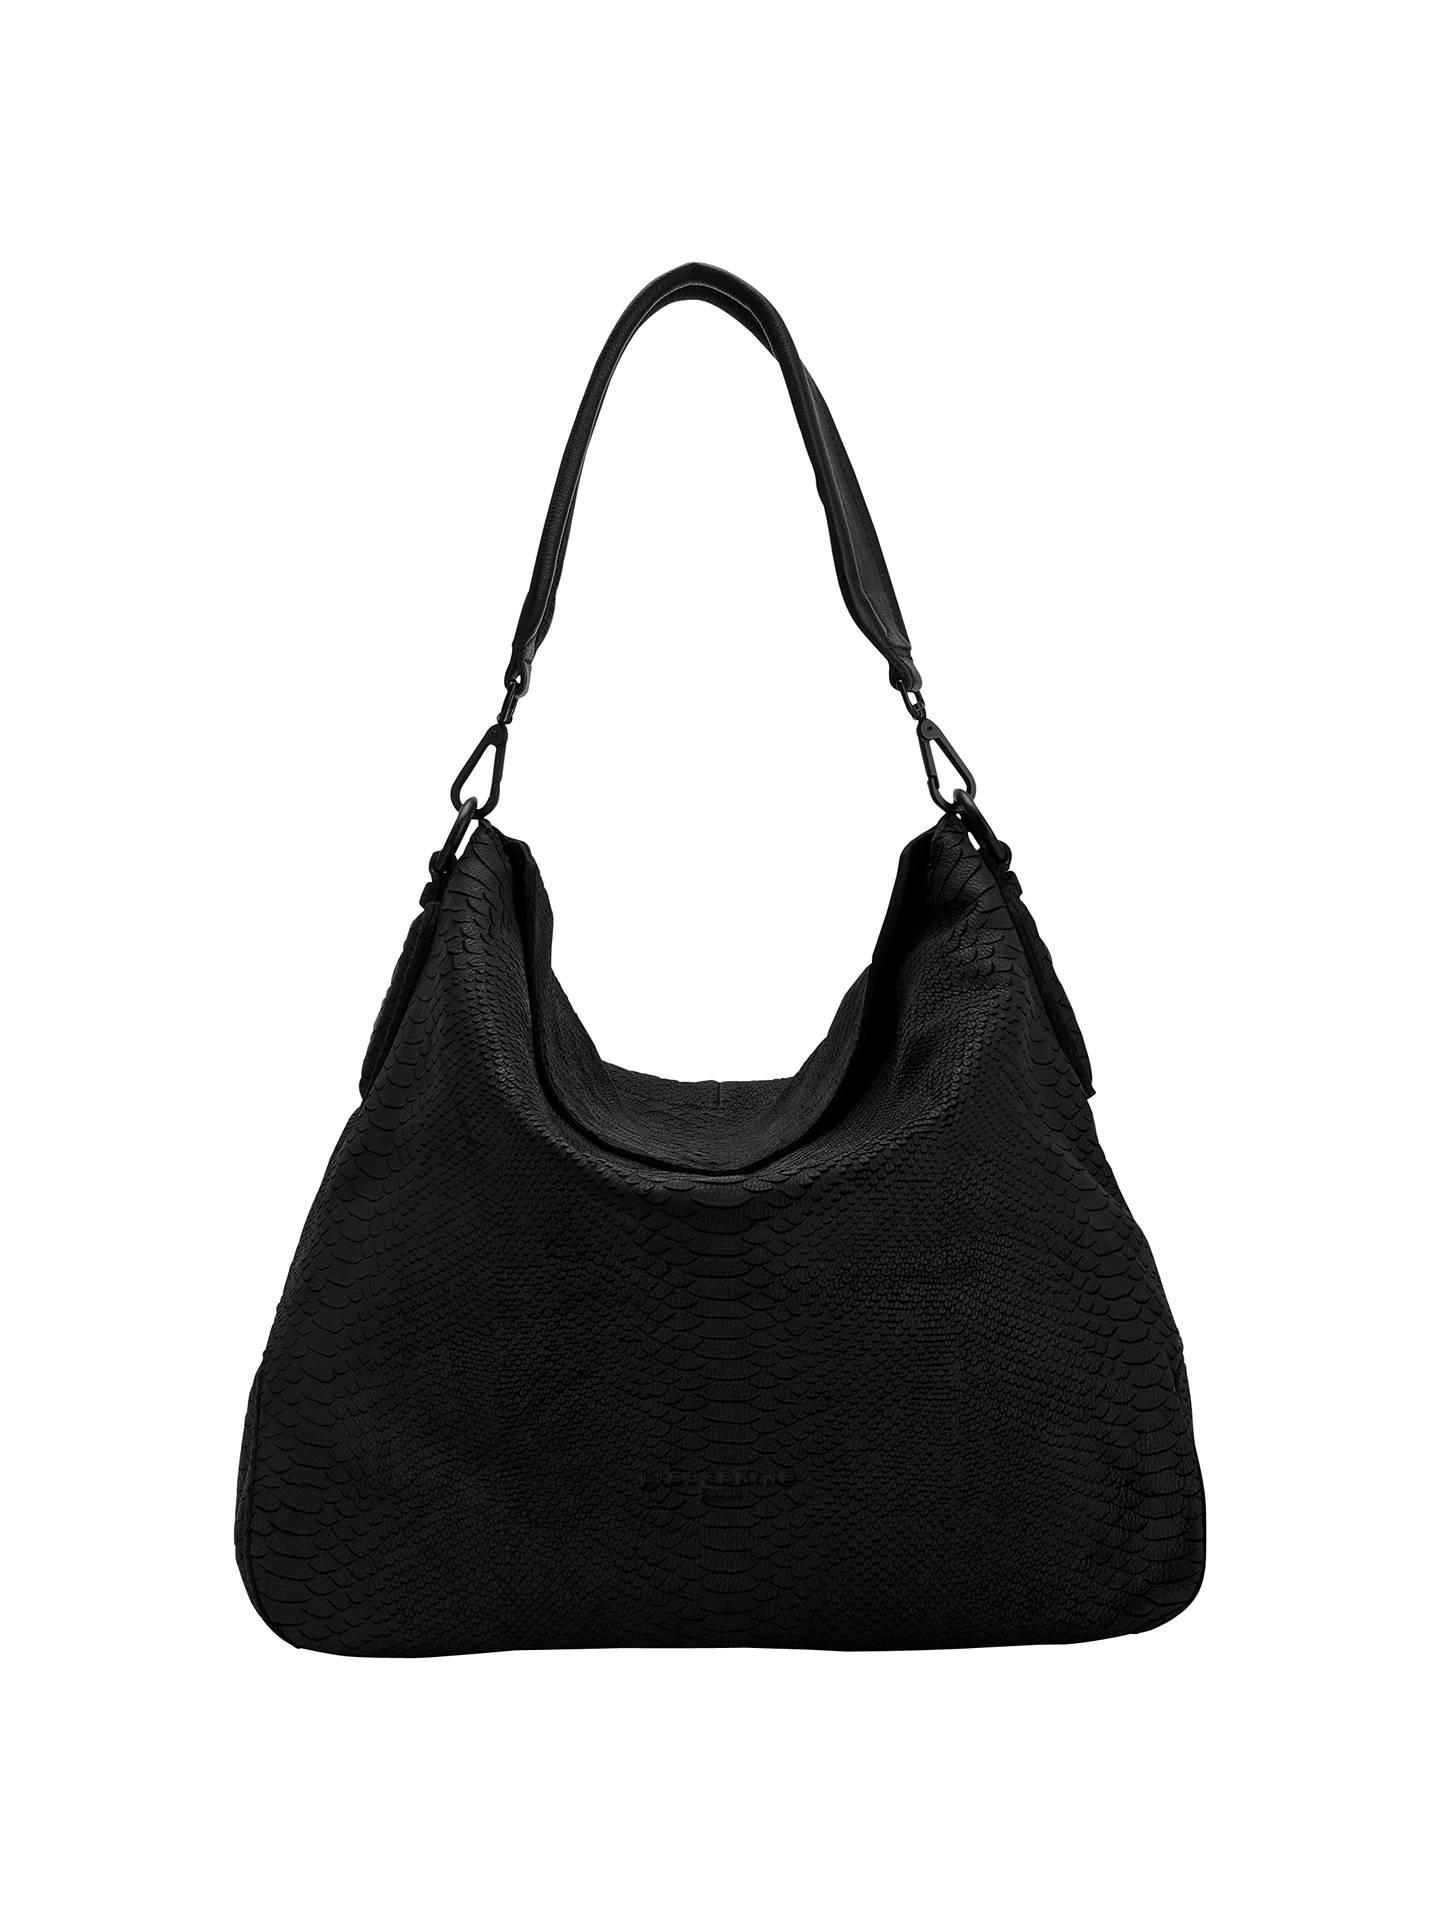 460f889da62 BuyLiebeskind Yokohama B Python Leather Hobo Bag, Ninja Black Online at  johnlewis.com ...